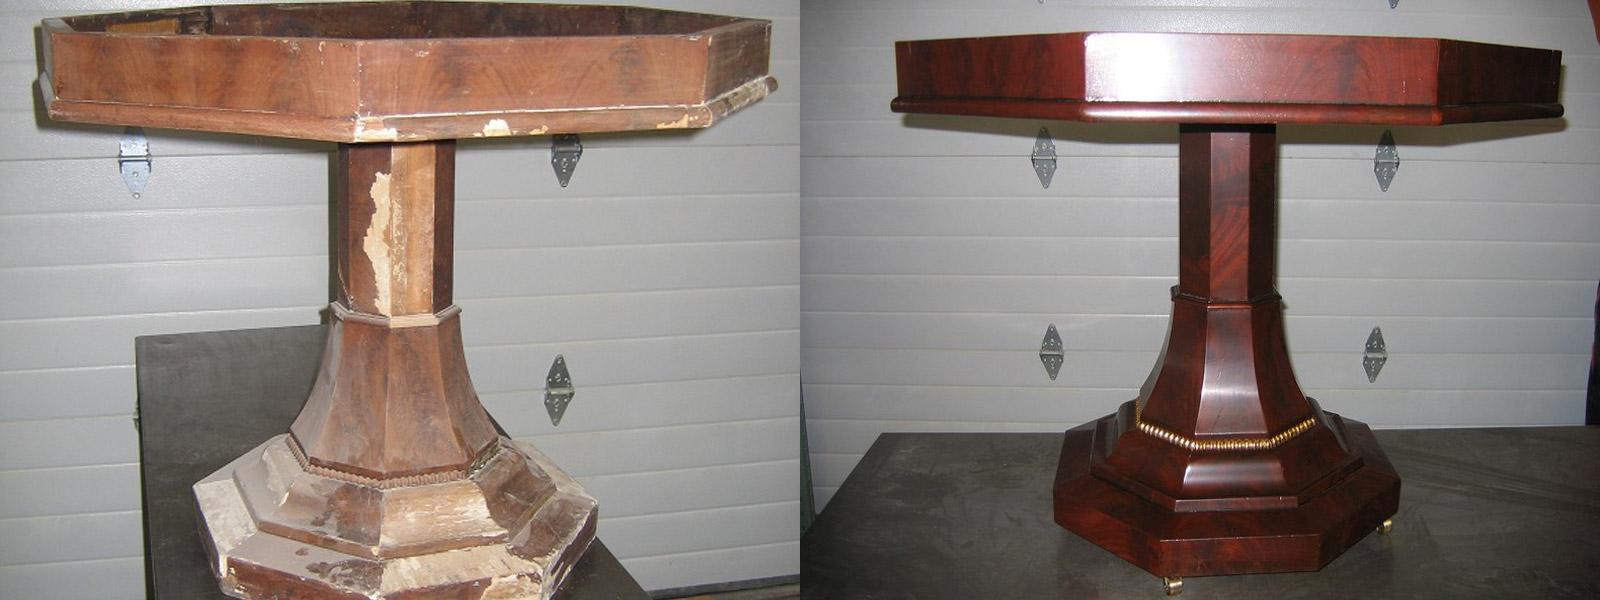 Antique Restoration Michigan Professional Furniture Restoration And Refinishing Gallery